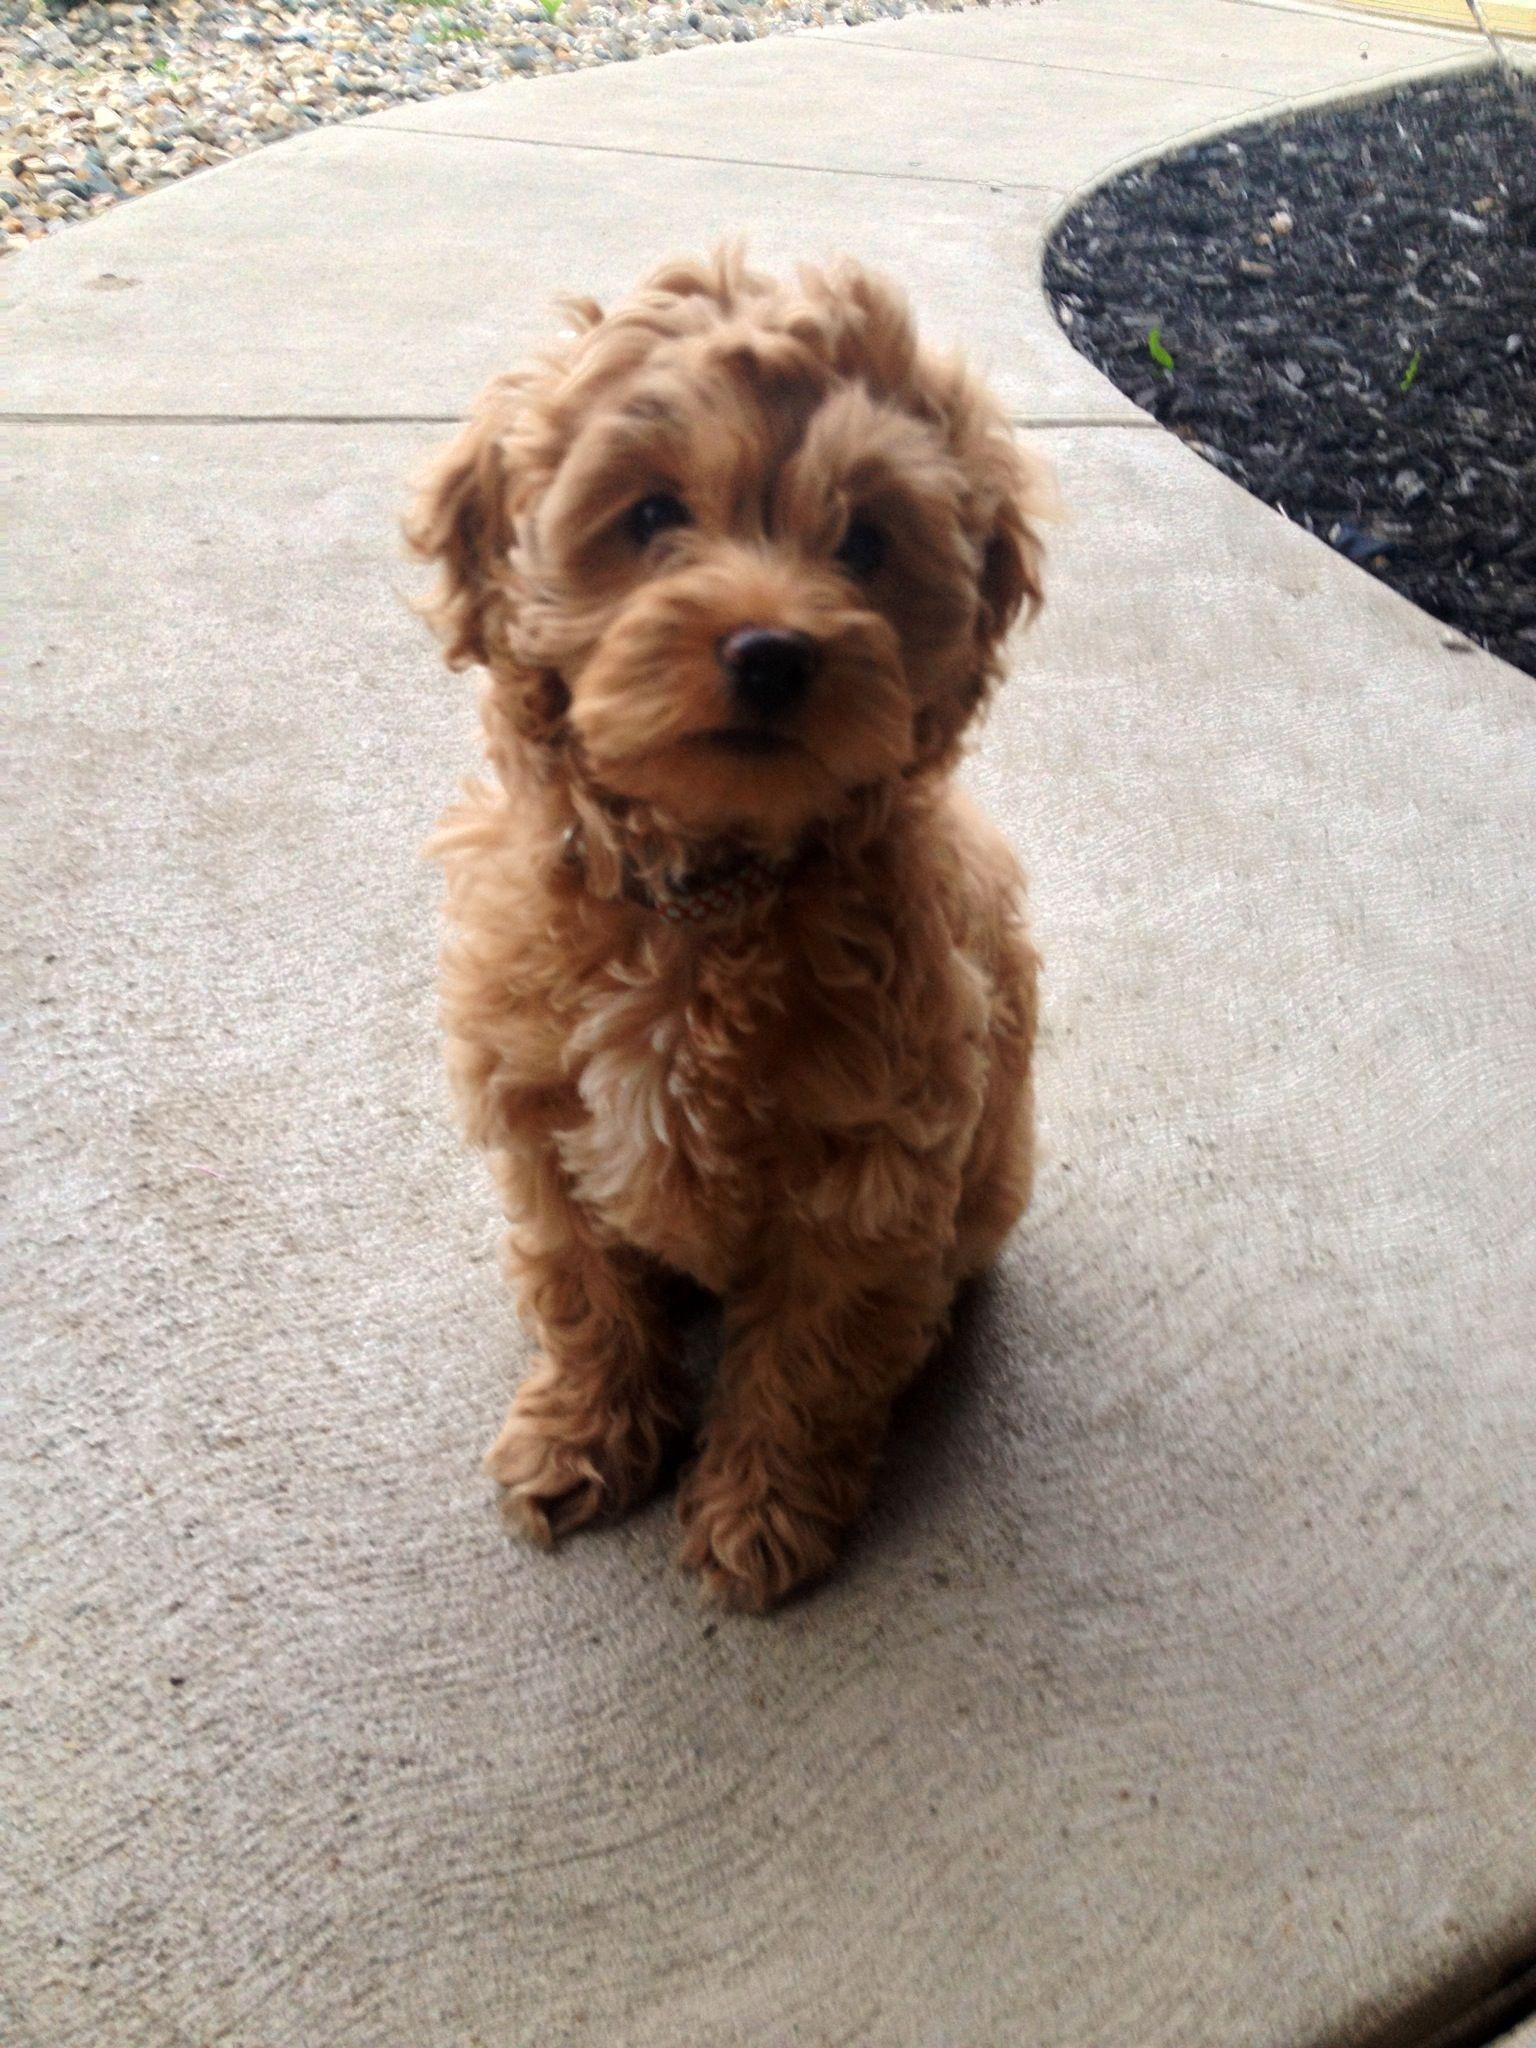 Puppyfinder.com: Cockapoo dogs for adoption near me in South Dakota